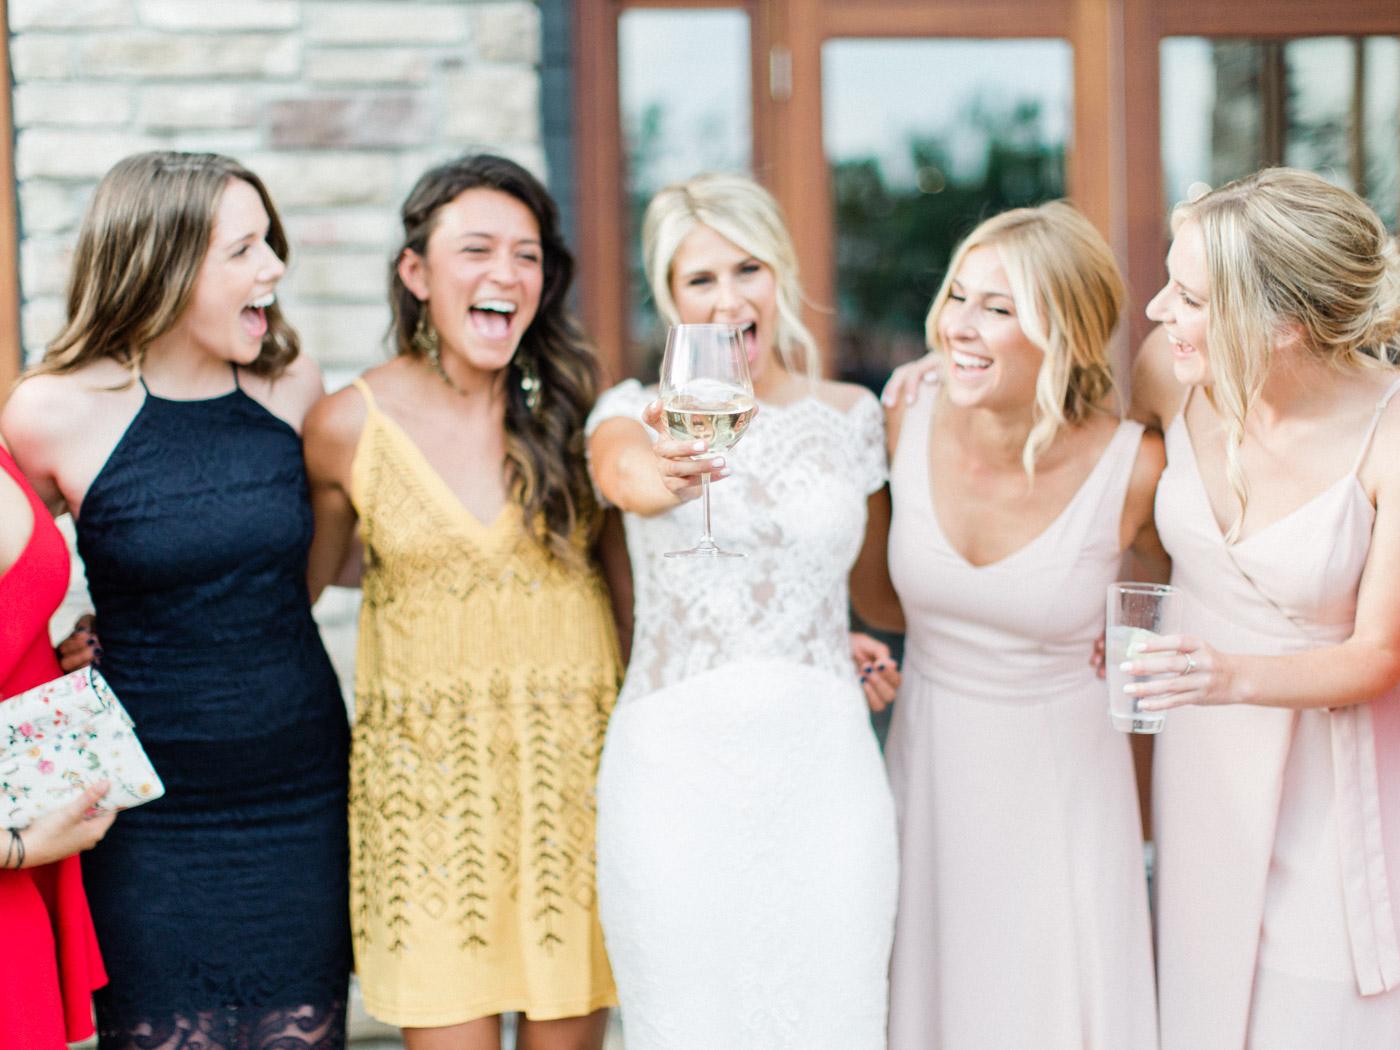 Toronto-Collingwood-Muskoka-Wedding-photographer-ideal-wedding-day-photography-timeline3.jpg